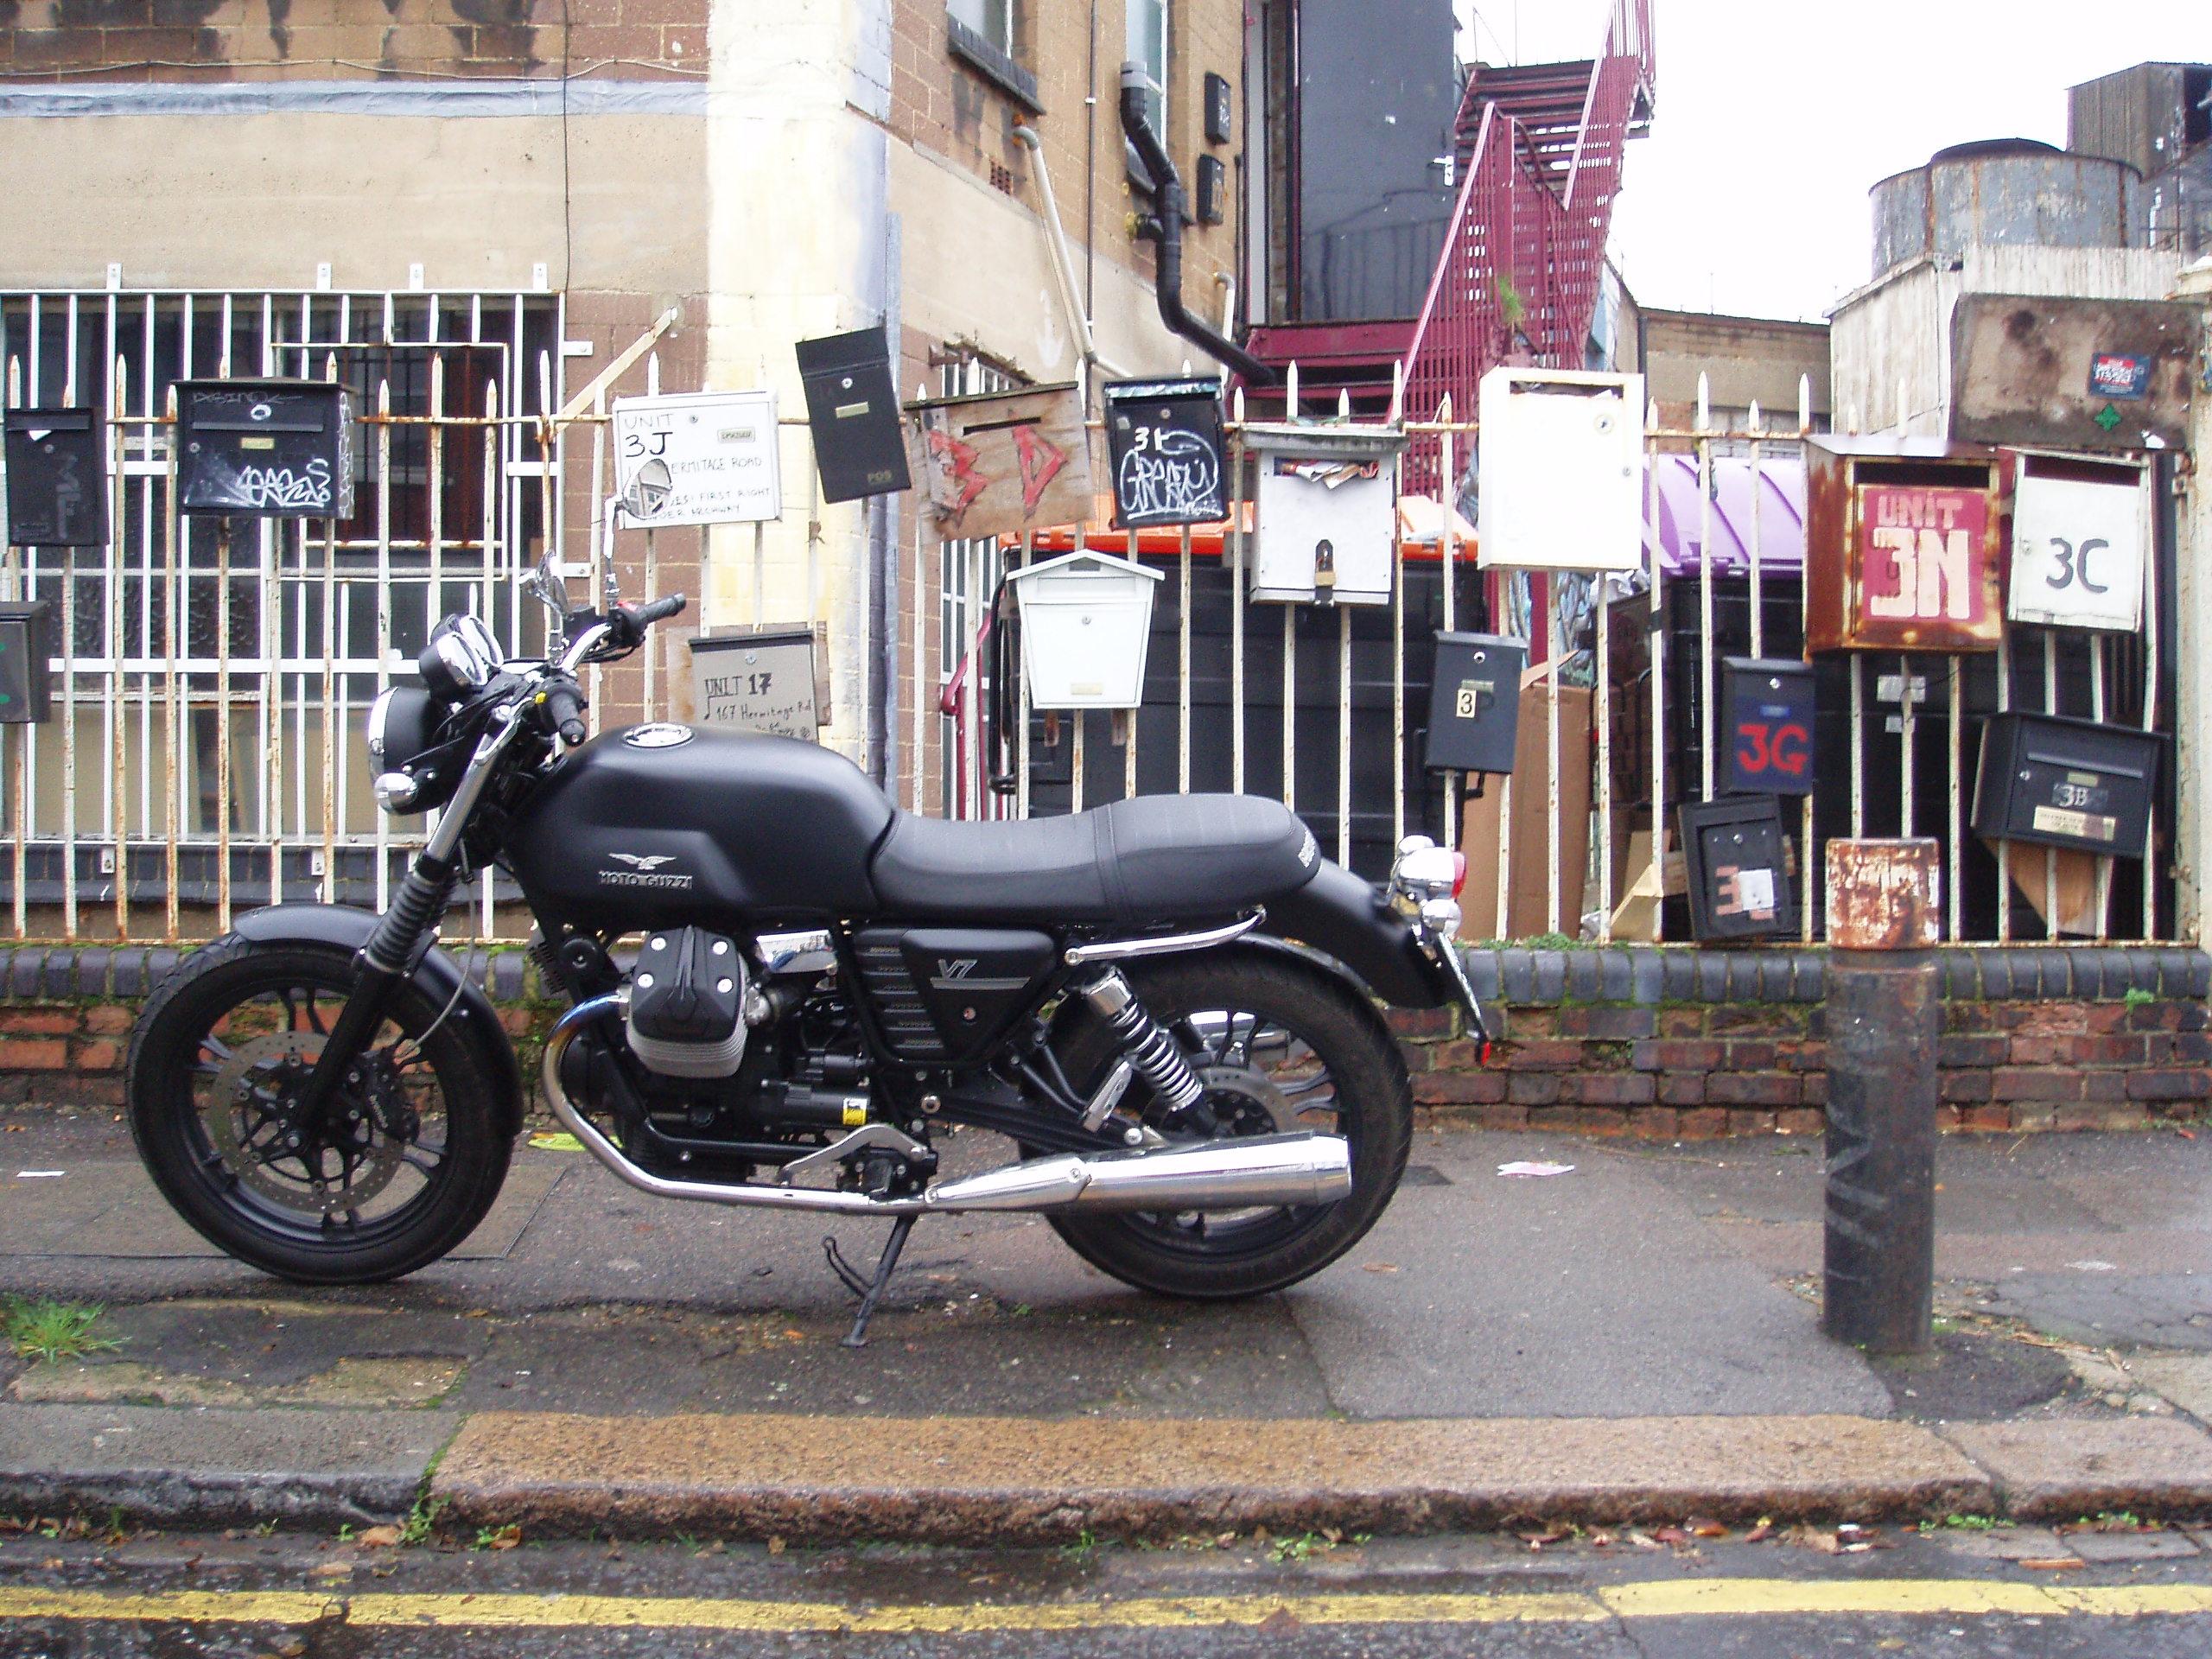 Long-term test: Moto Guzzi V7 Stone review   Visordown